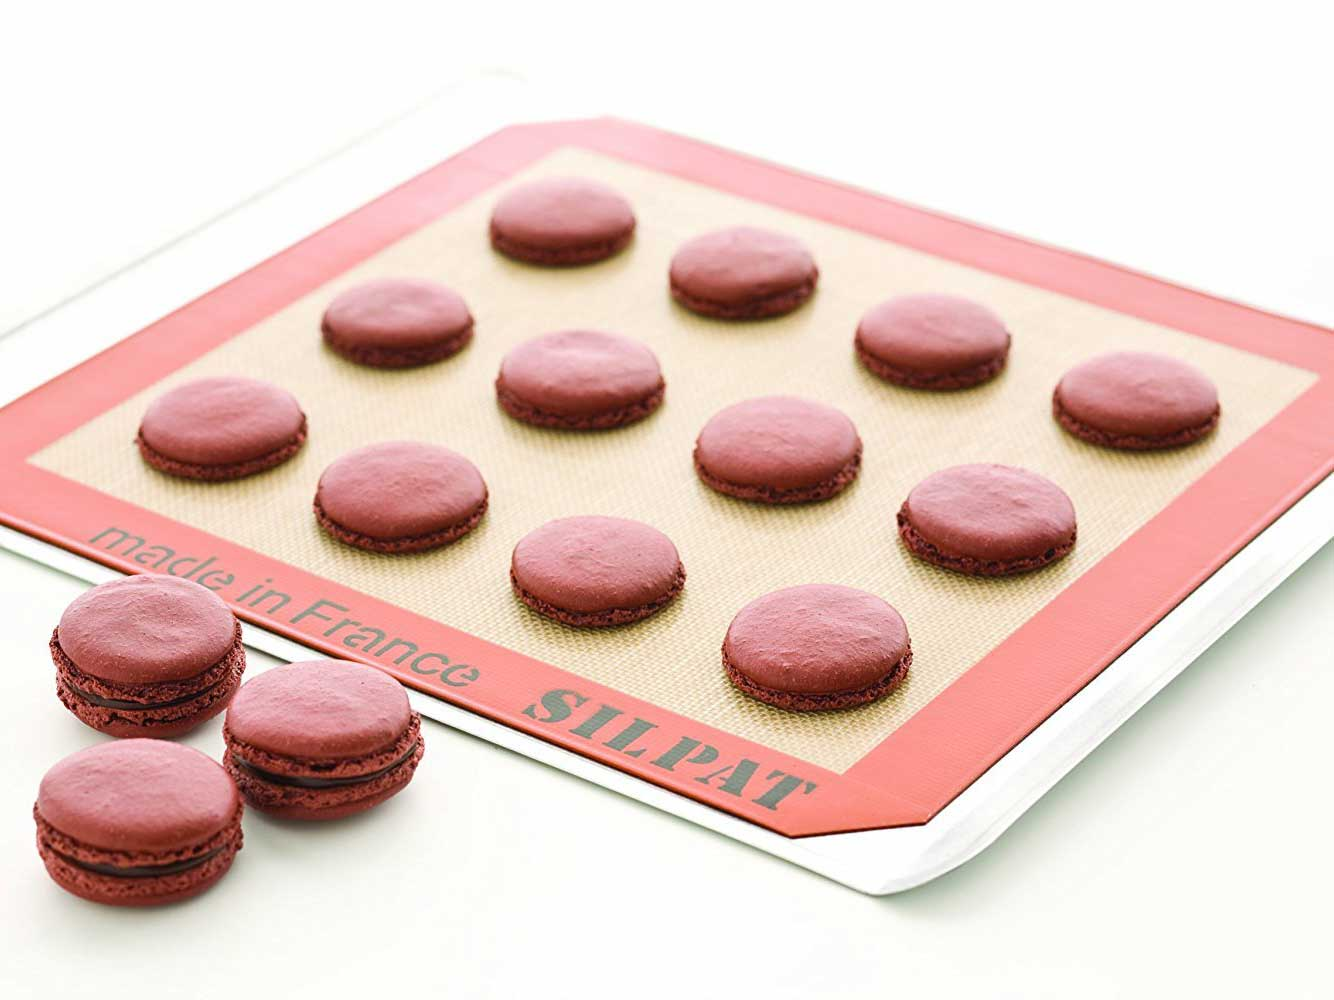 "Silpat Premium Non-Stick Silicone Baking Mat with Storage Band, Half Sheet Size, 11-5/8"" x 16-1/2"""